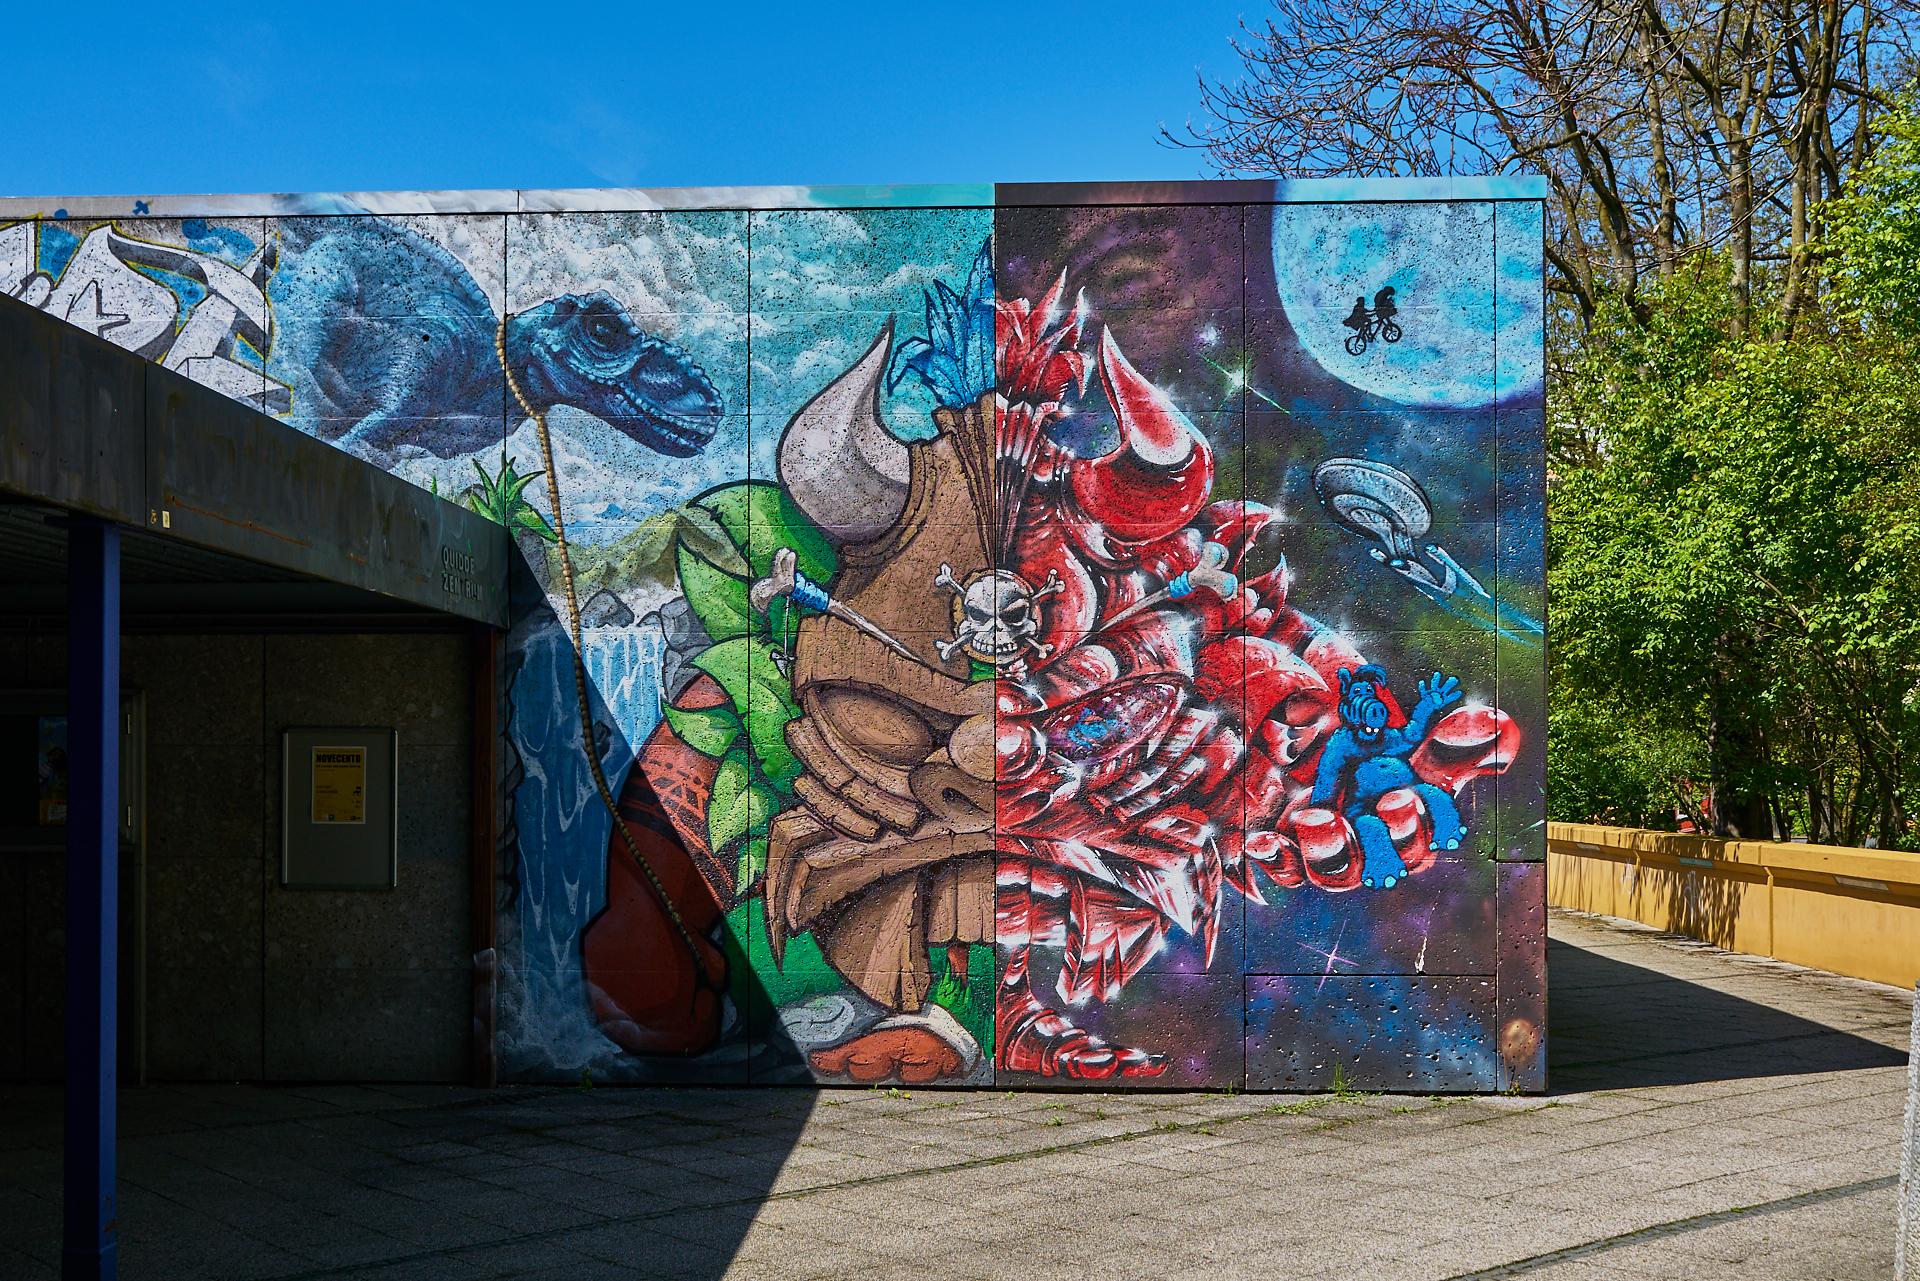 Einmalige Graffitis im Quiddezentrum